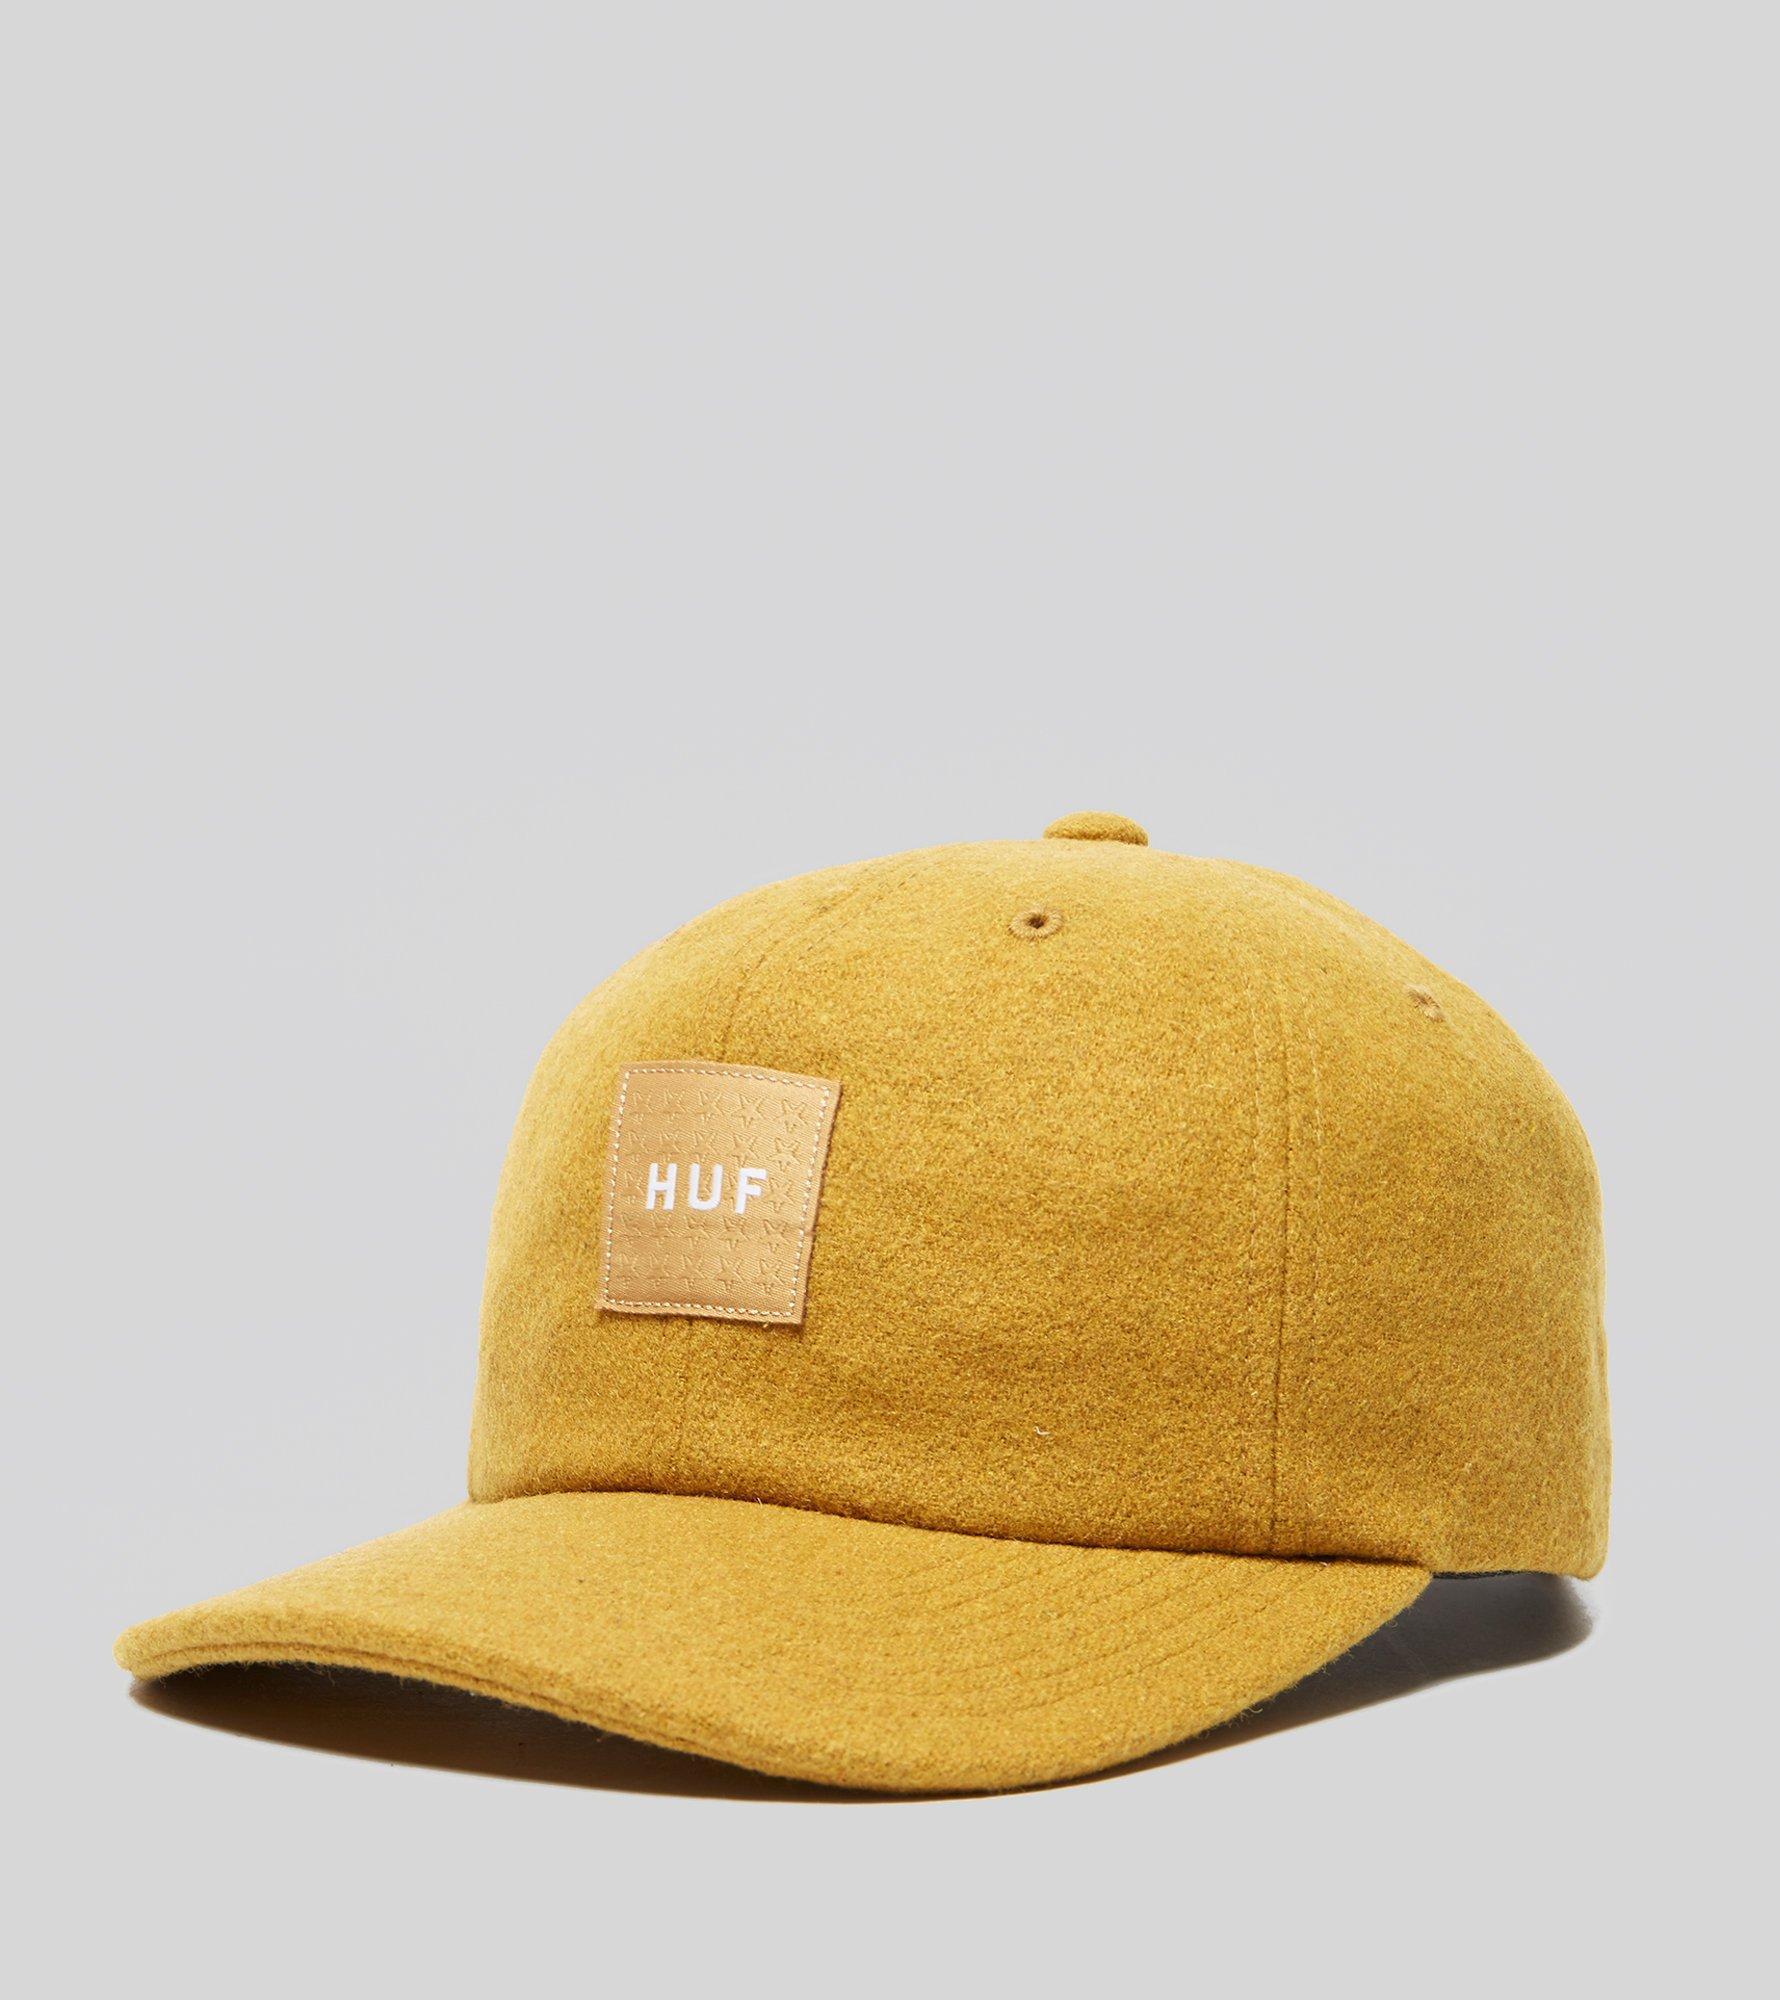 1568f92d703 ... germany lyst huf wool box logo hat in yellow for men c8843 edd42